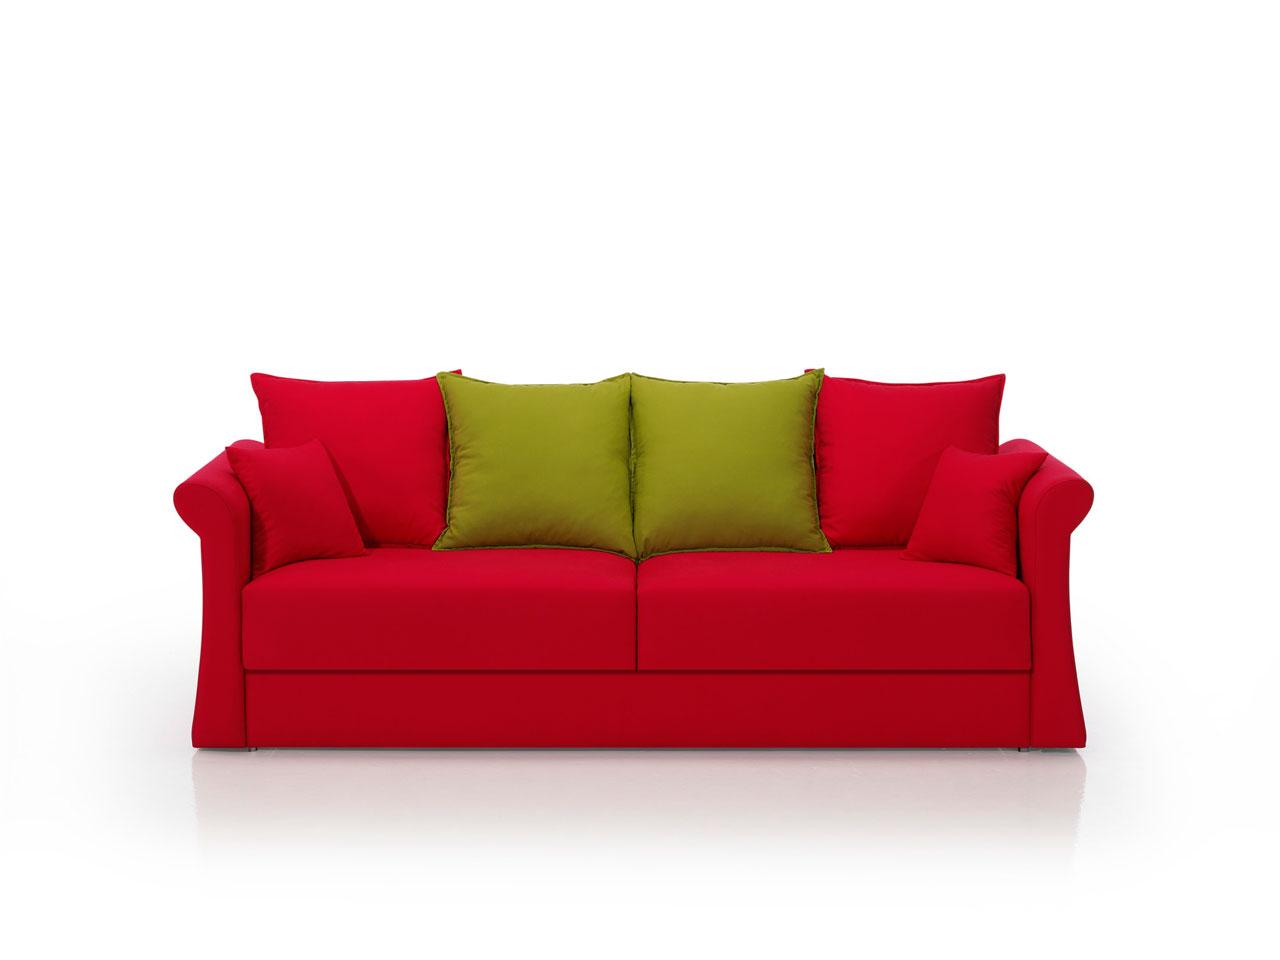 Sofa cama rojo online la mesa de centro - Sofas camas comodos ...